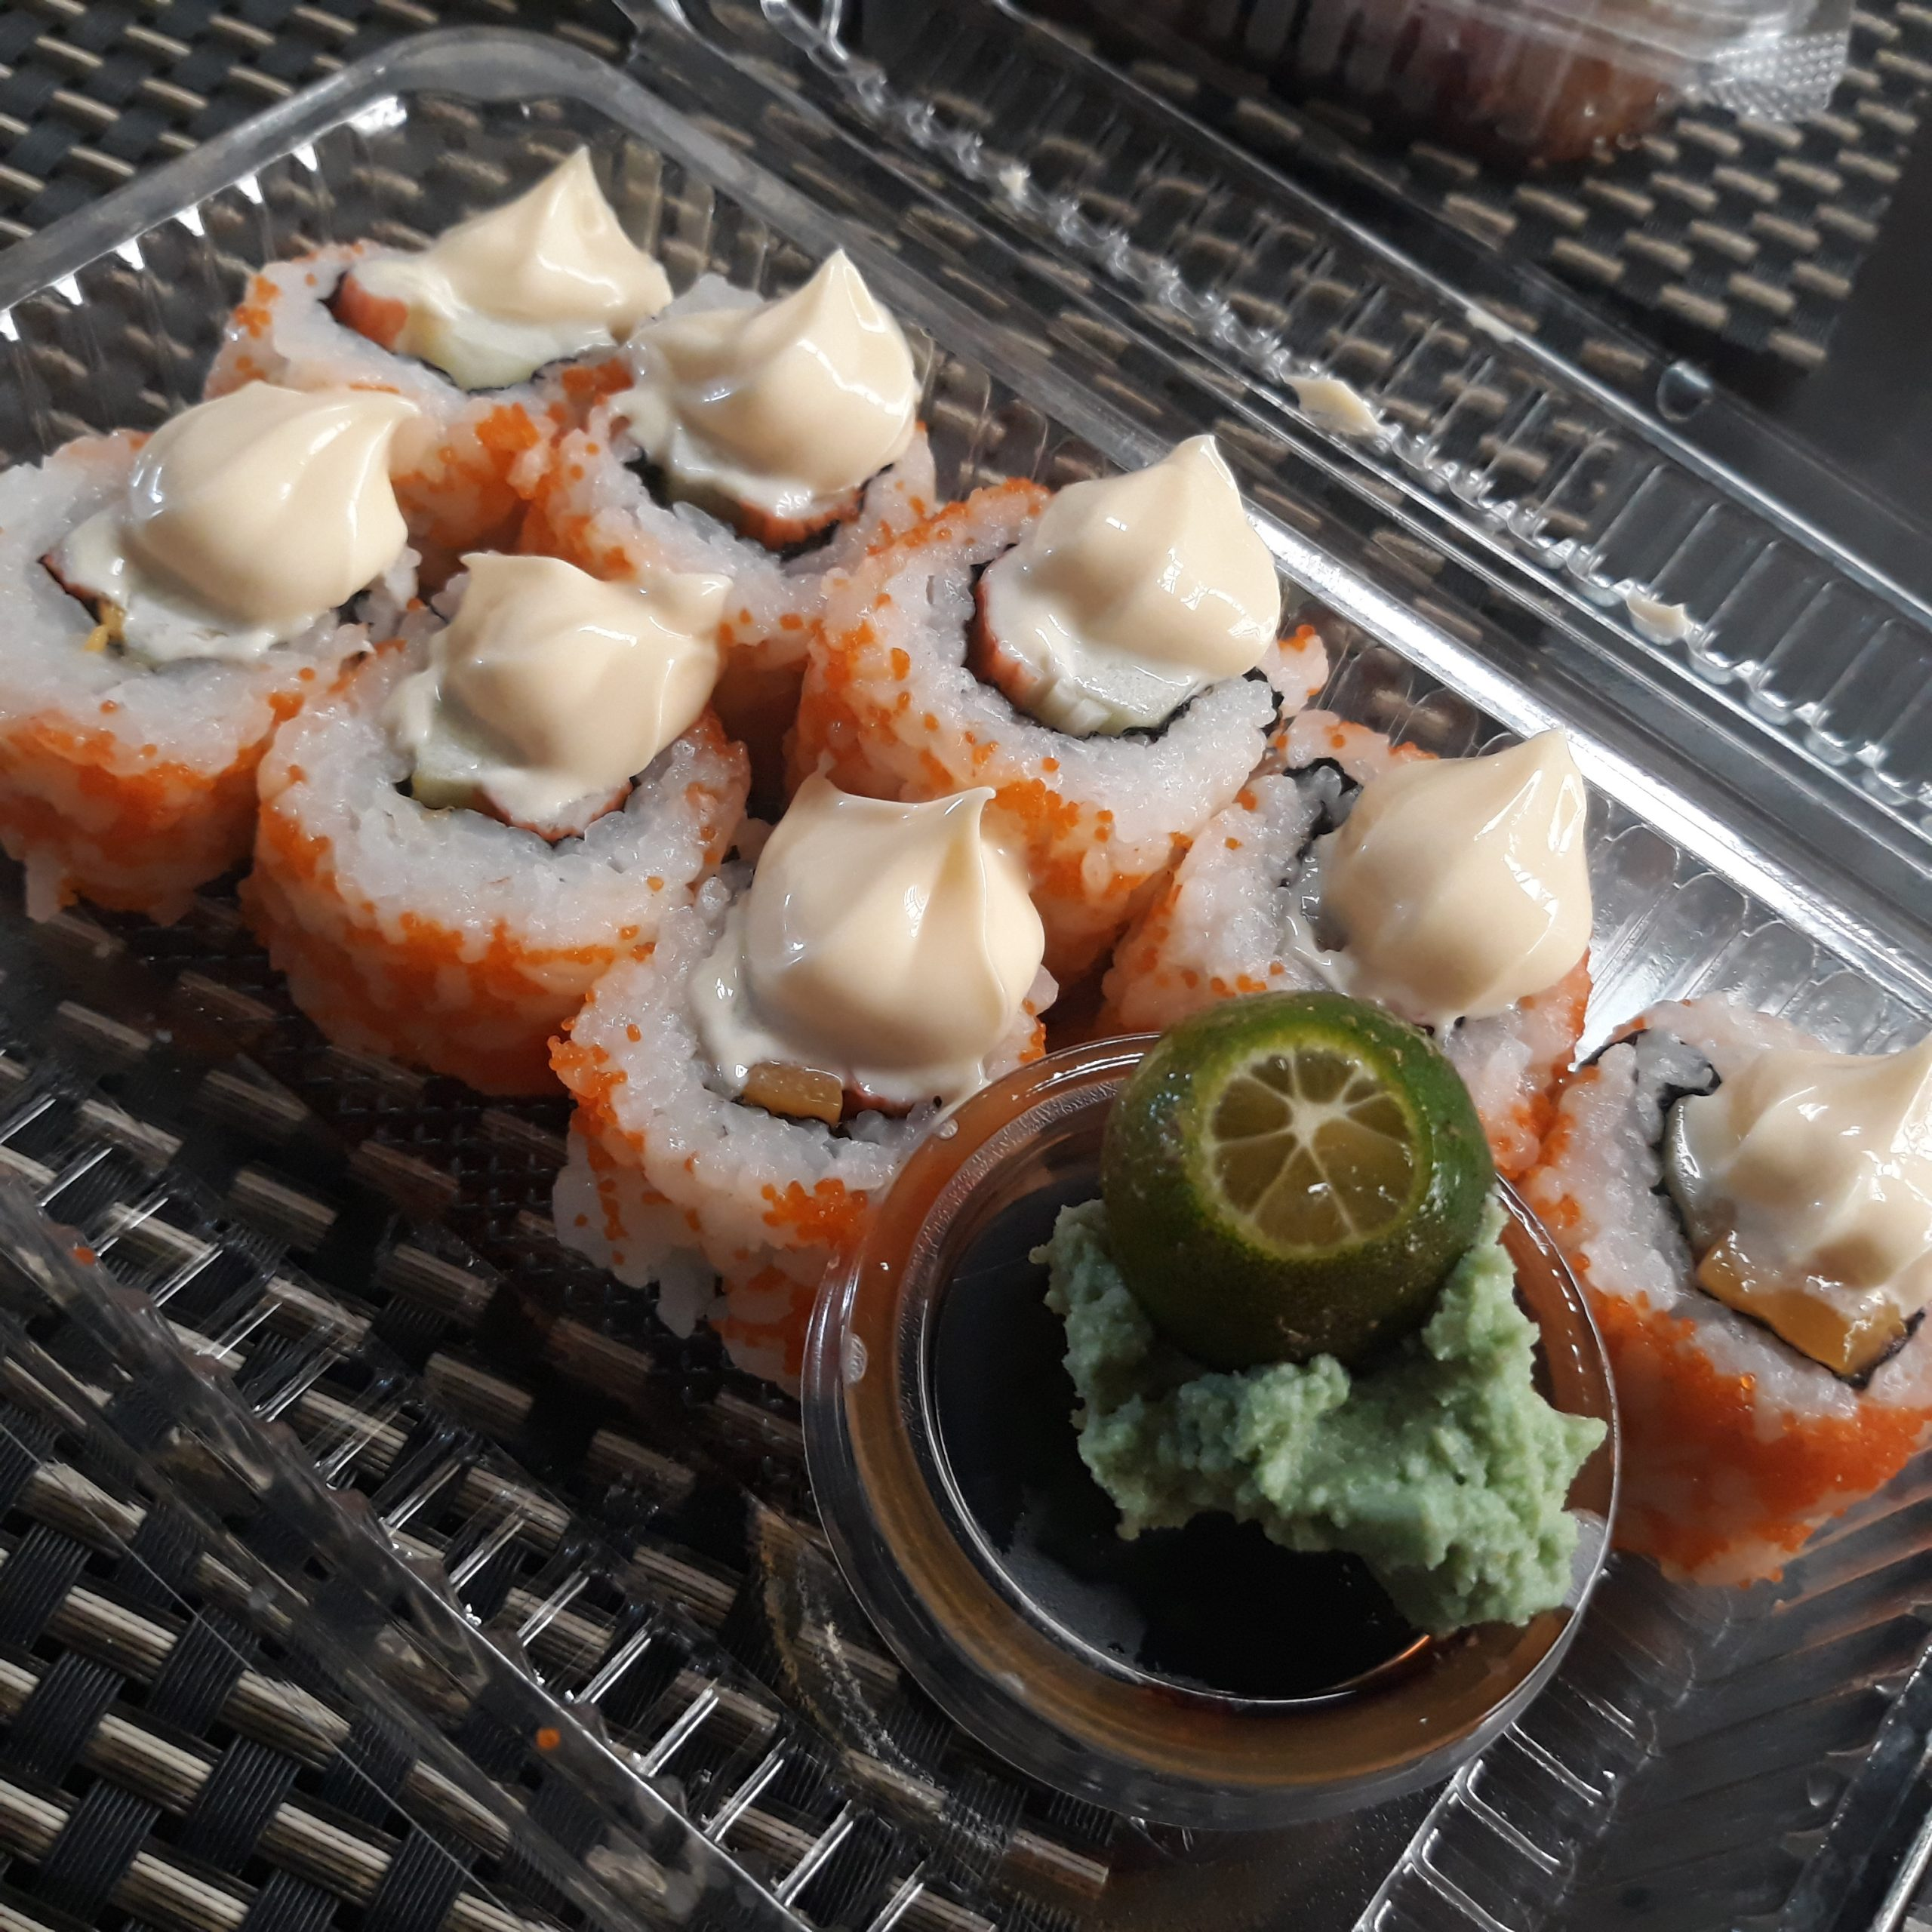 California Maki delivery from Ariake Japanese Restaurant.